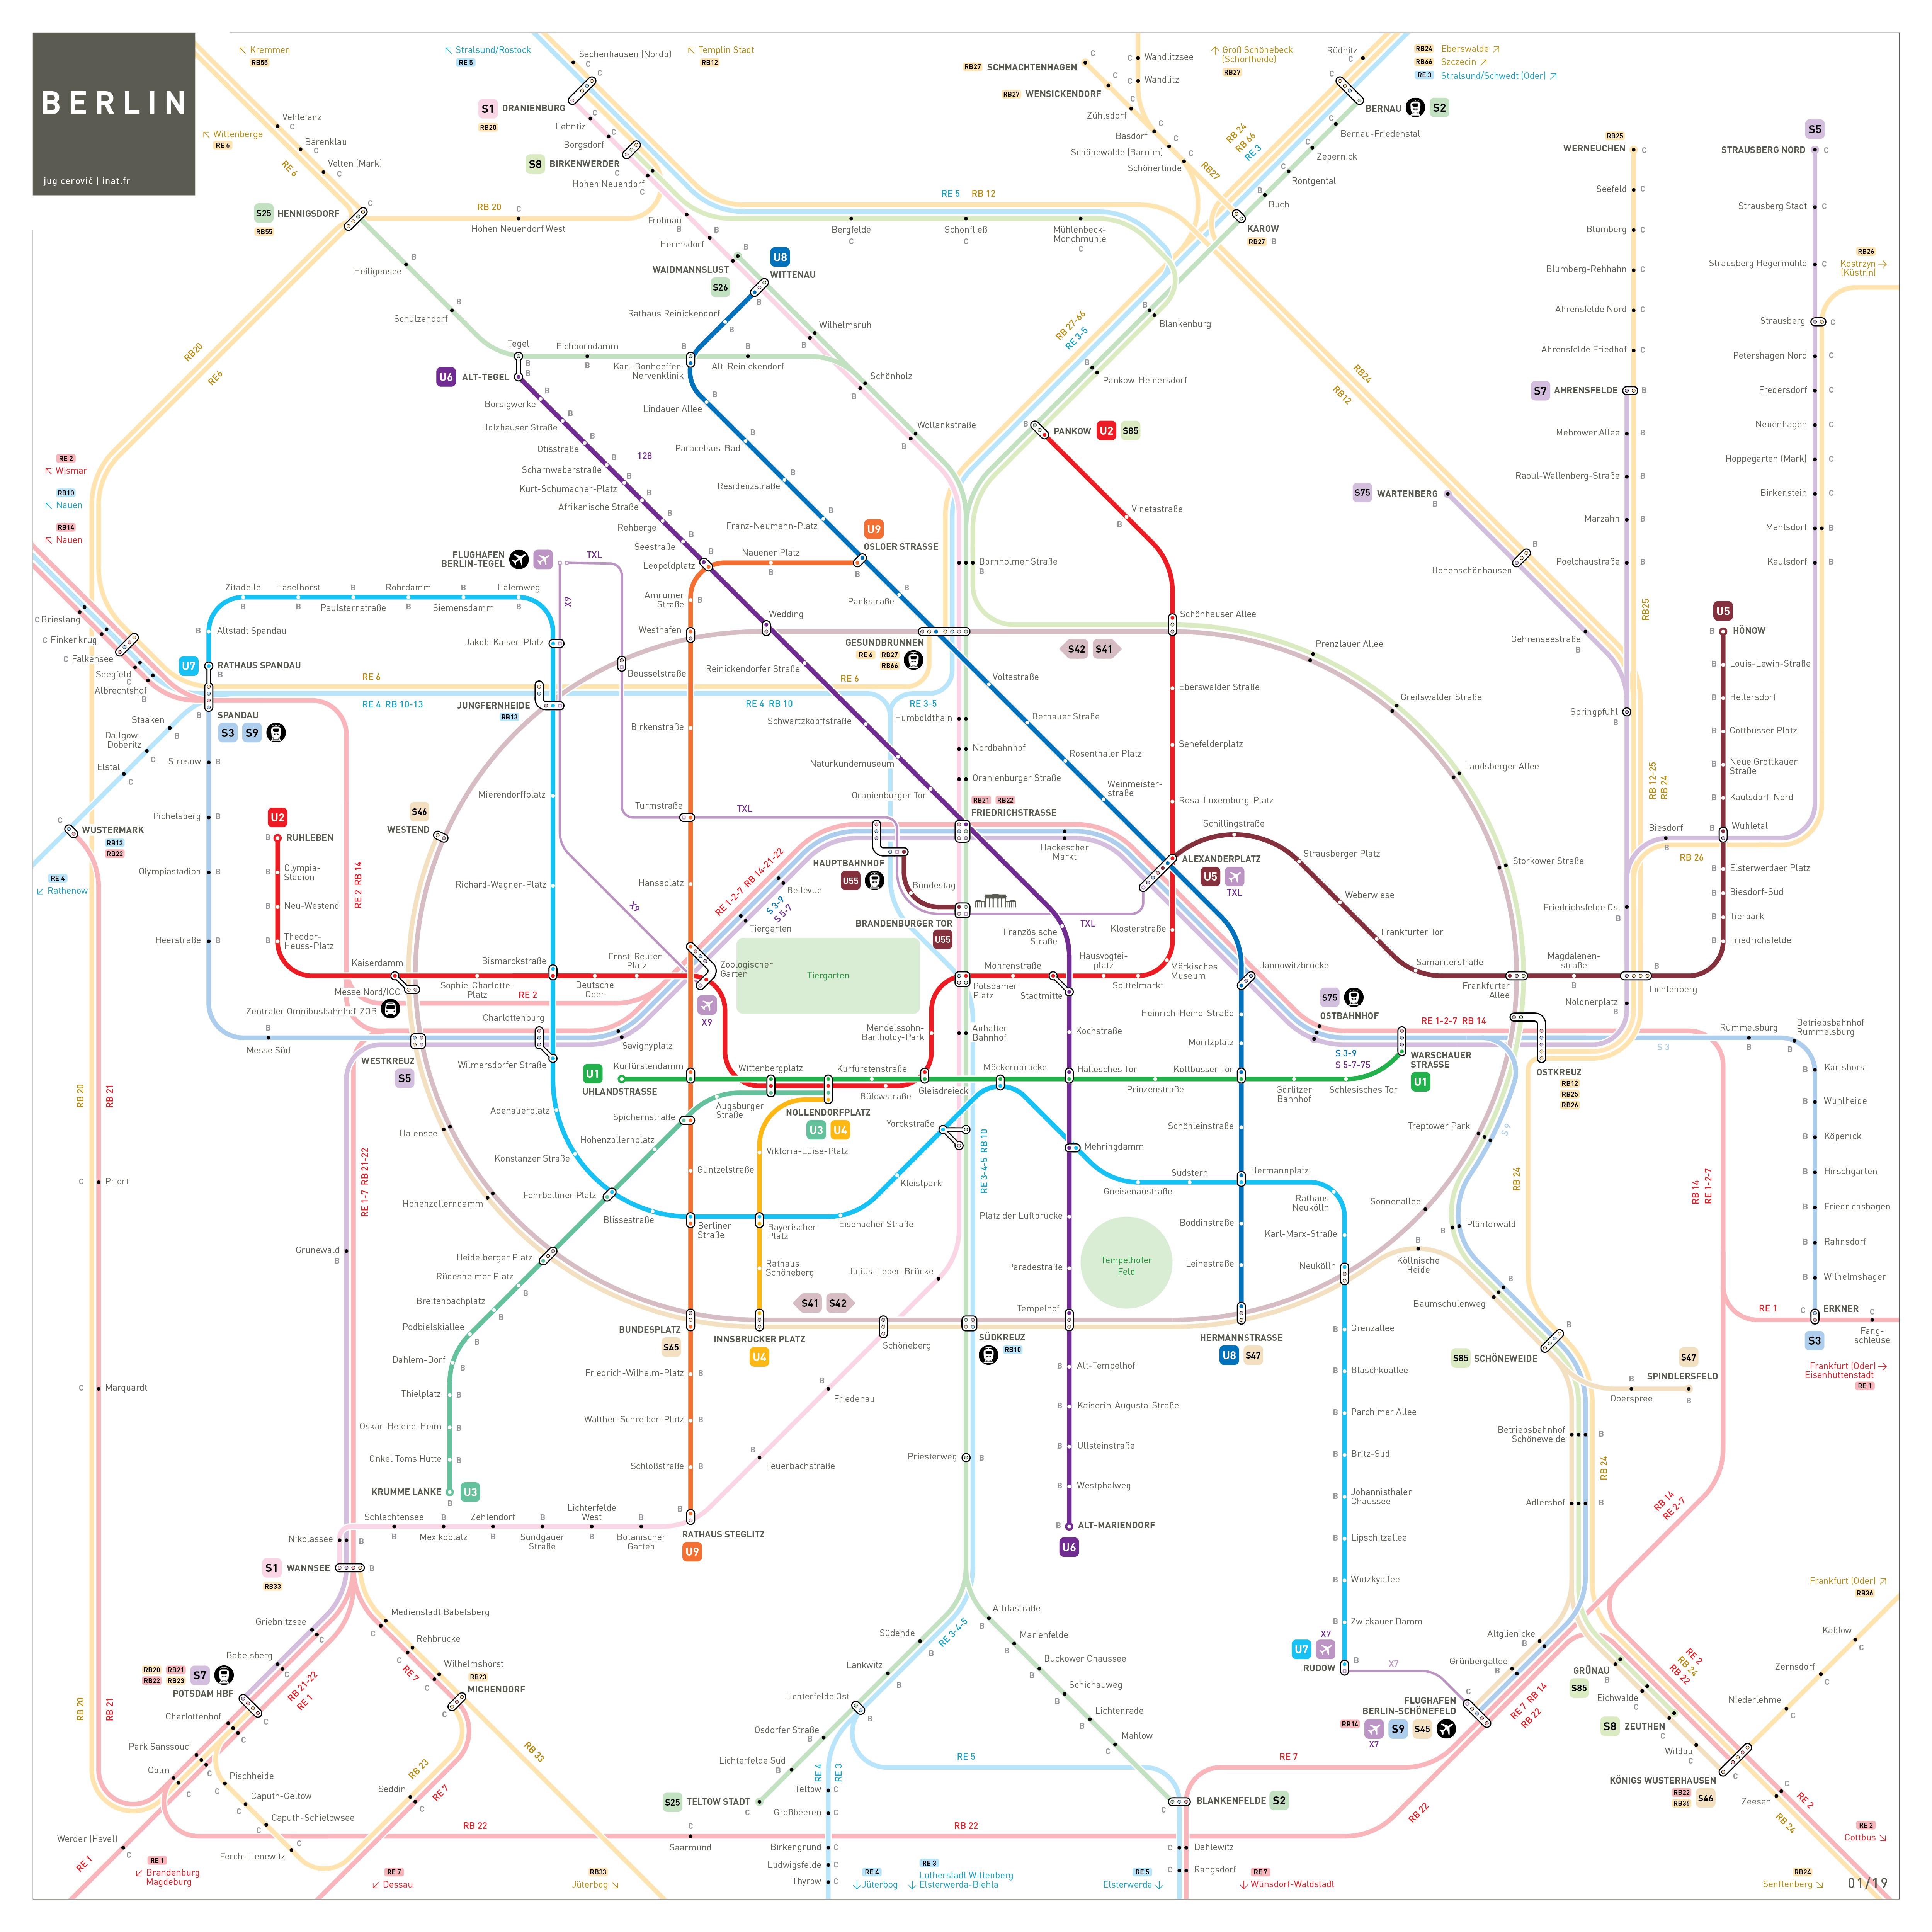 Berlin metro map u bahn netzplan Liniennetz